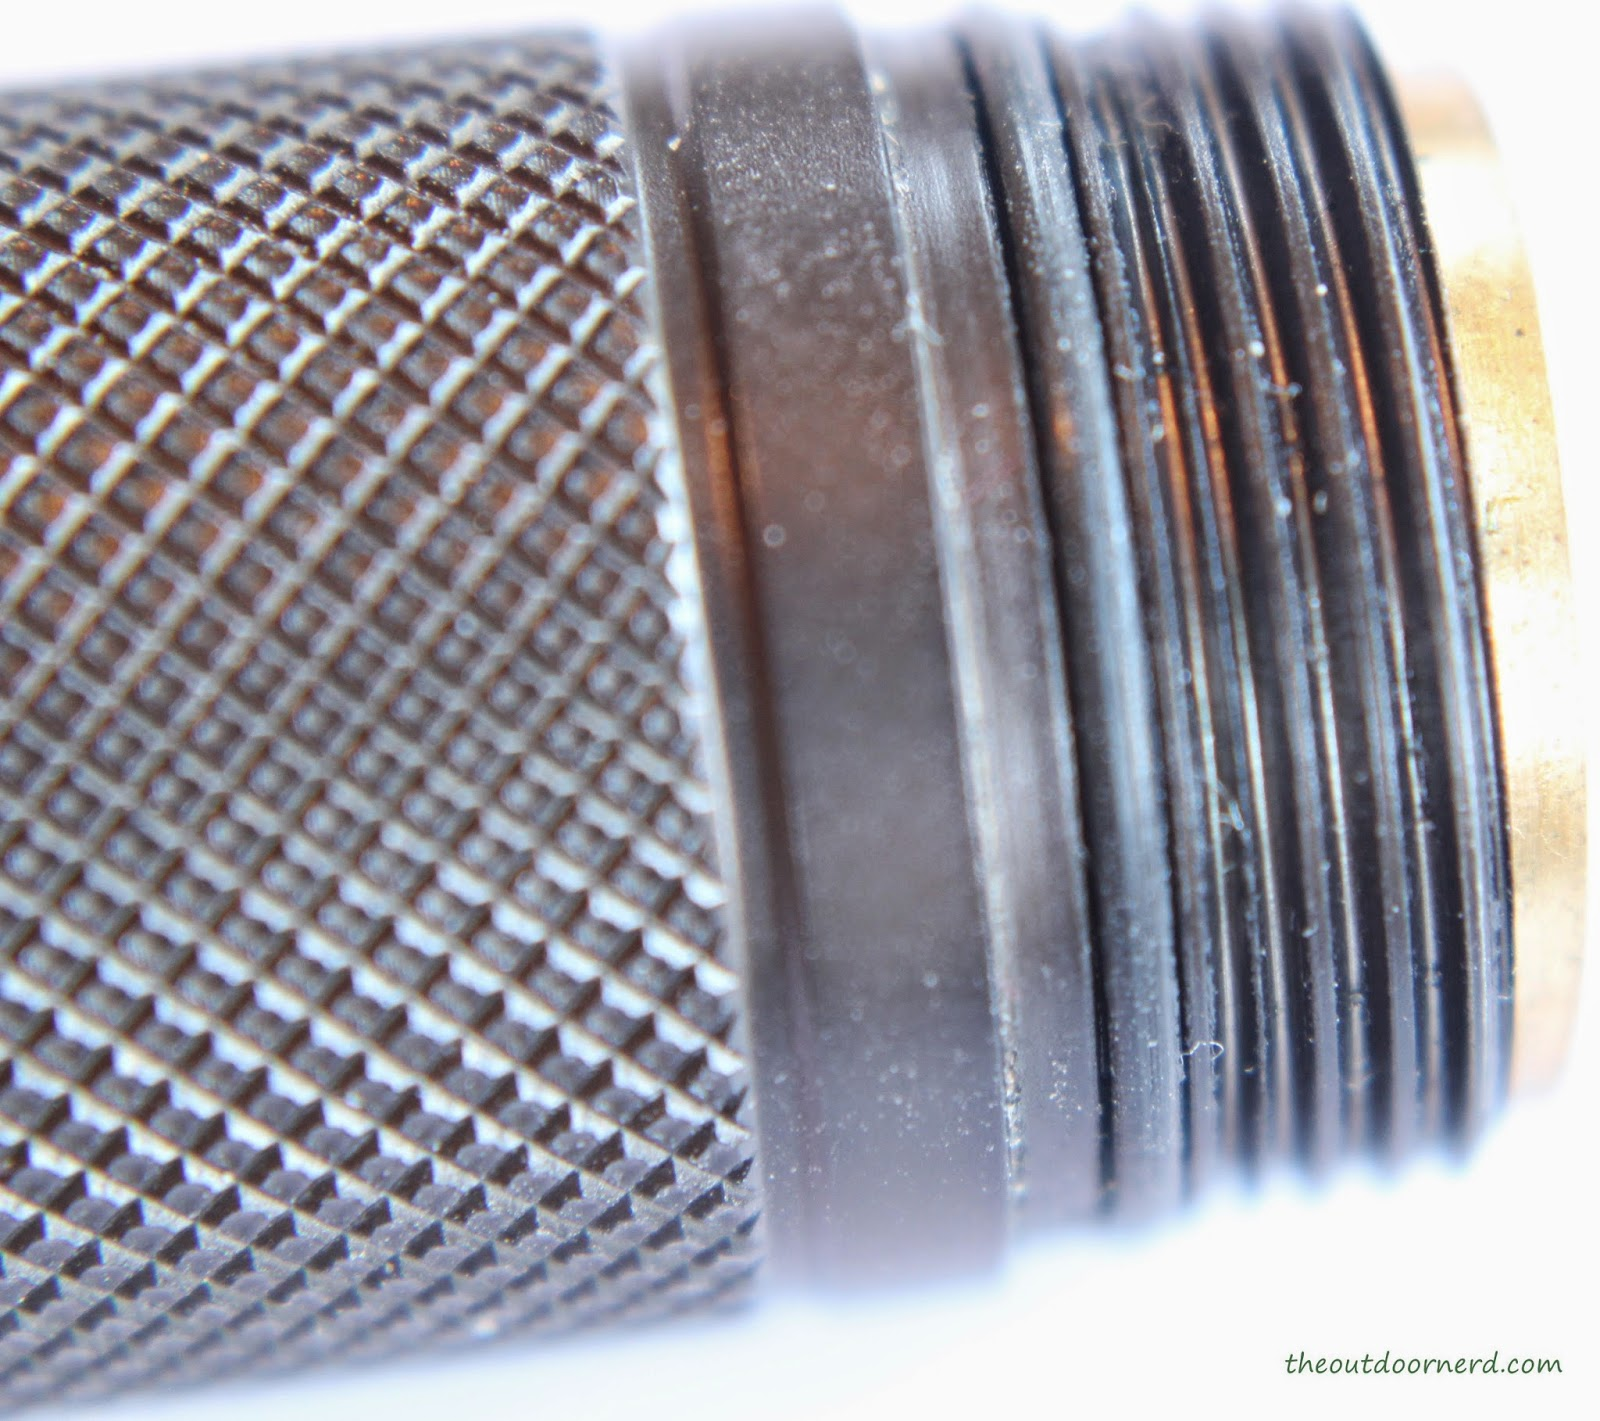 Nitecore Ex10 1xCR123A Flashlight : Closeup Of Tube Threads